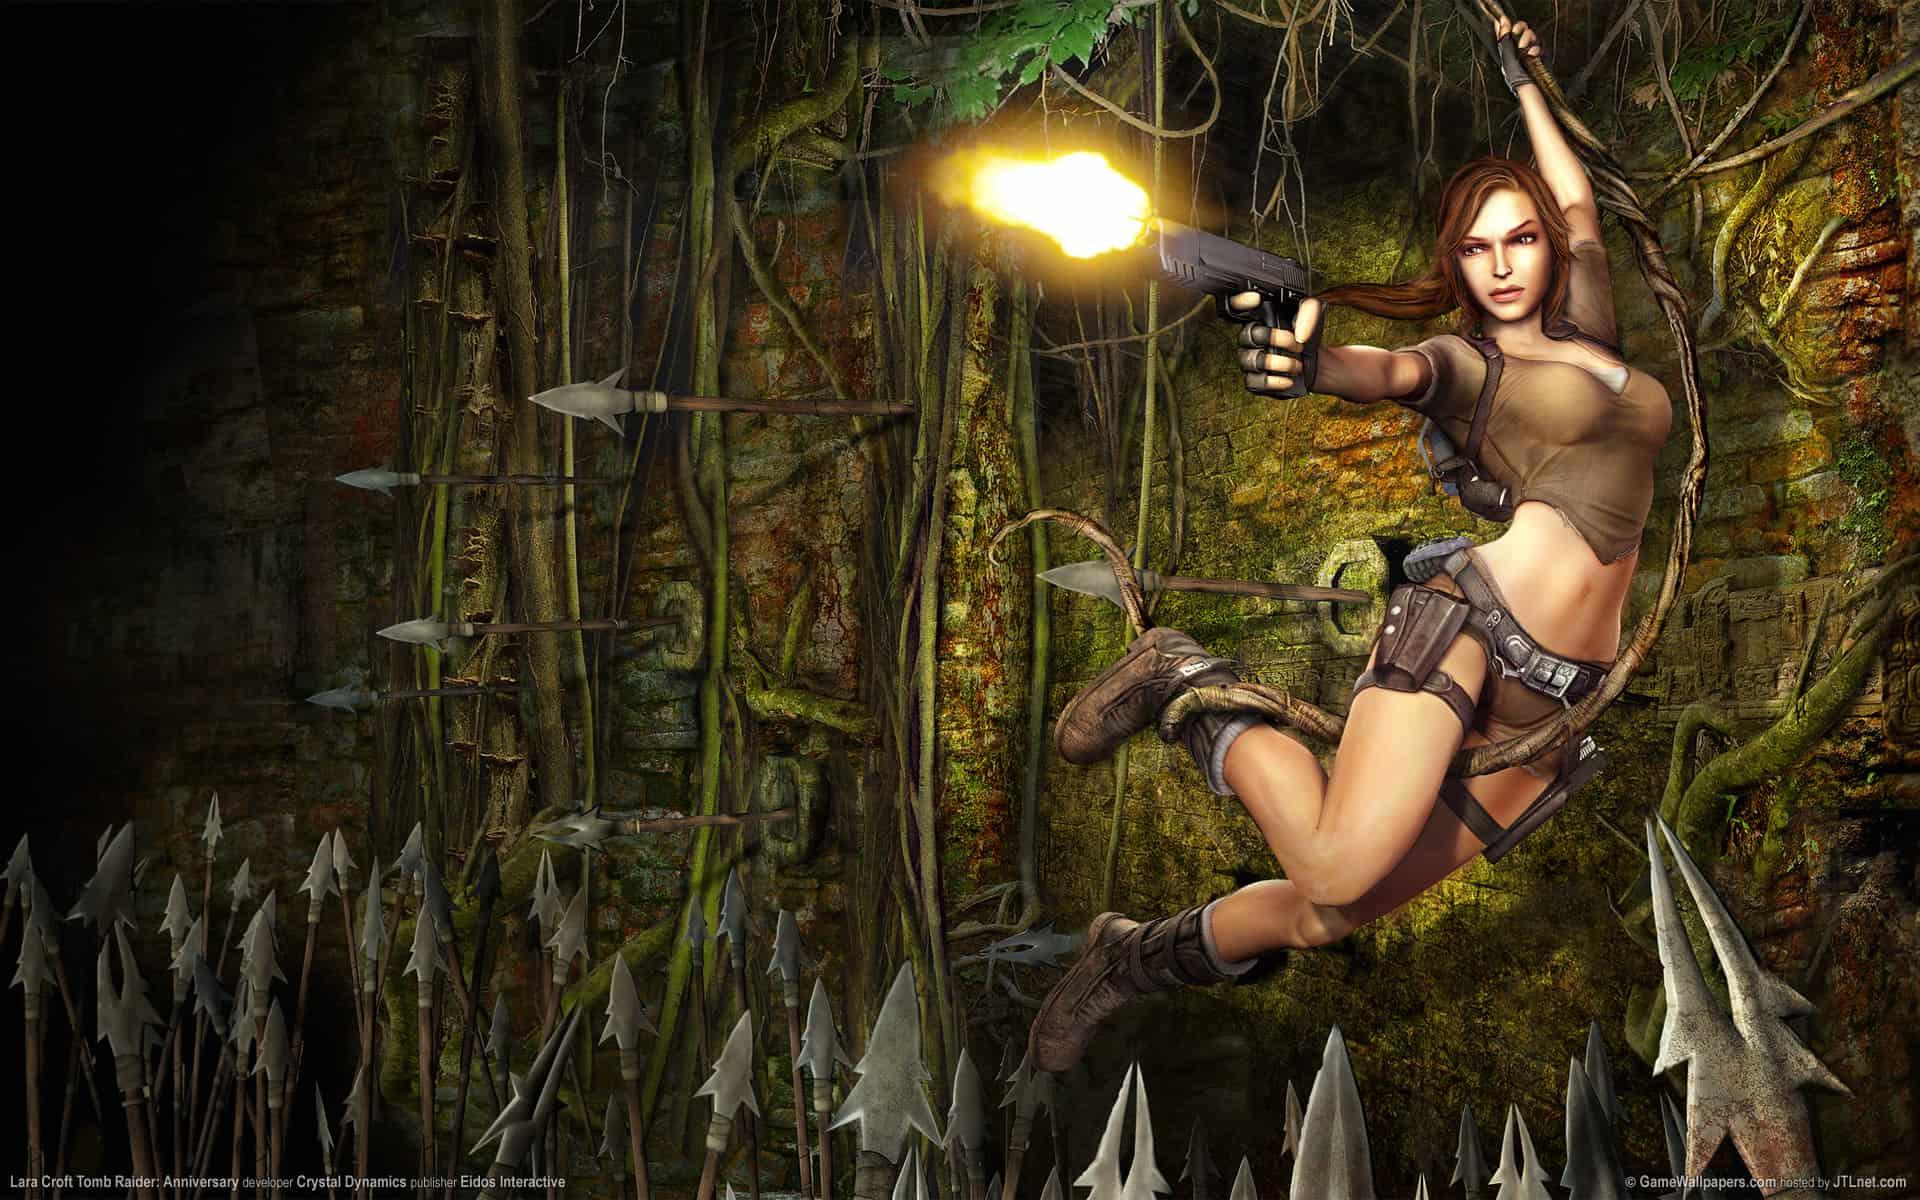 Tomb Raider Keygen Crack Key + Torrent Files Game | FREE Download , Télécharger gratuitement